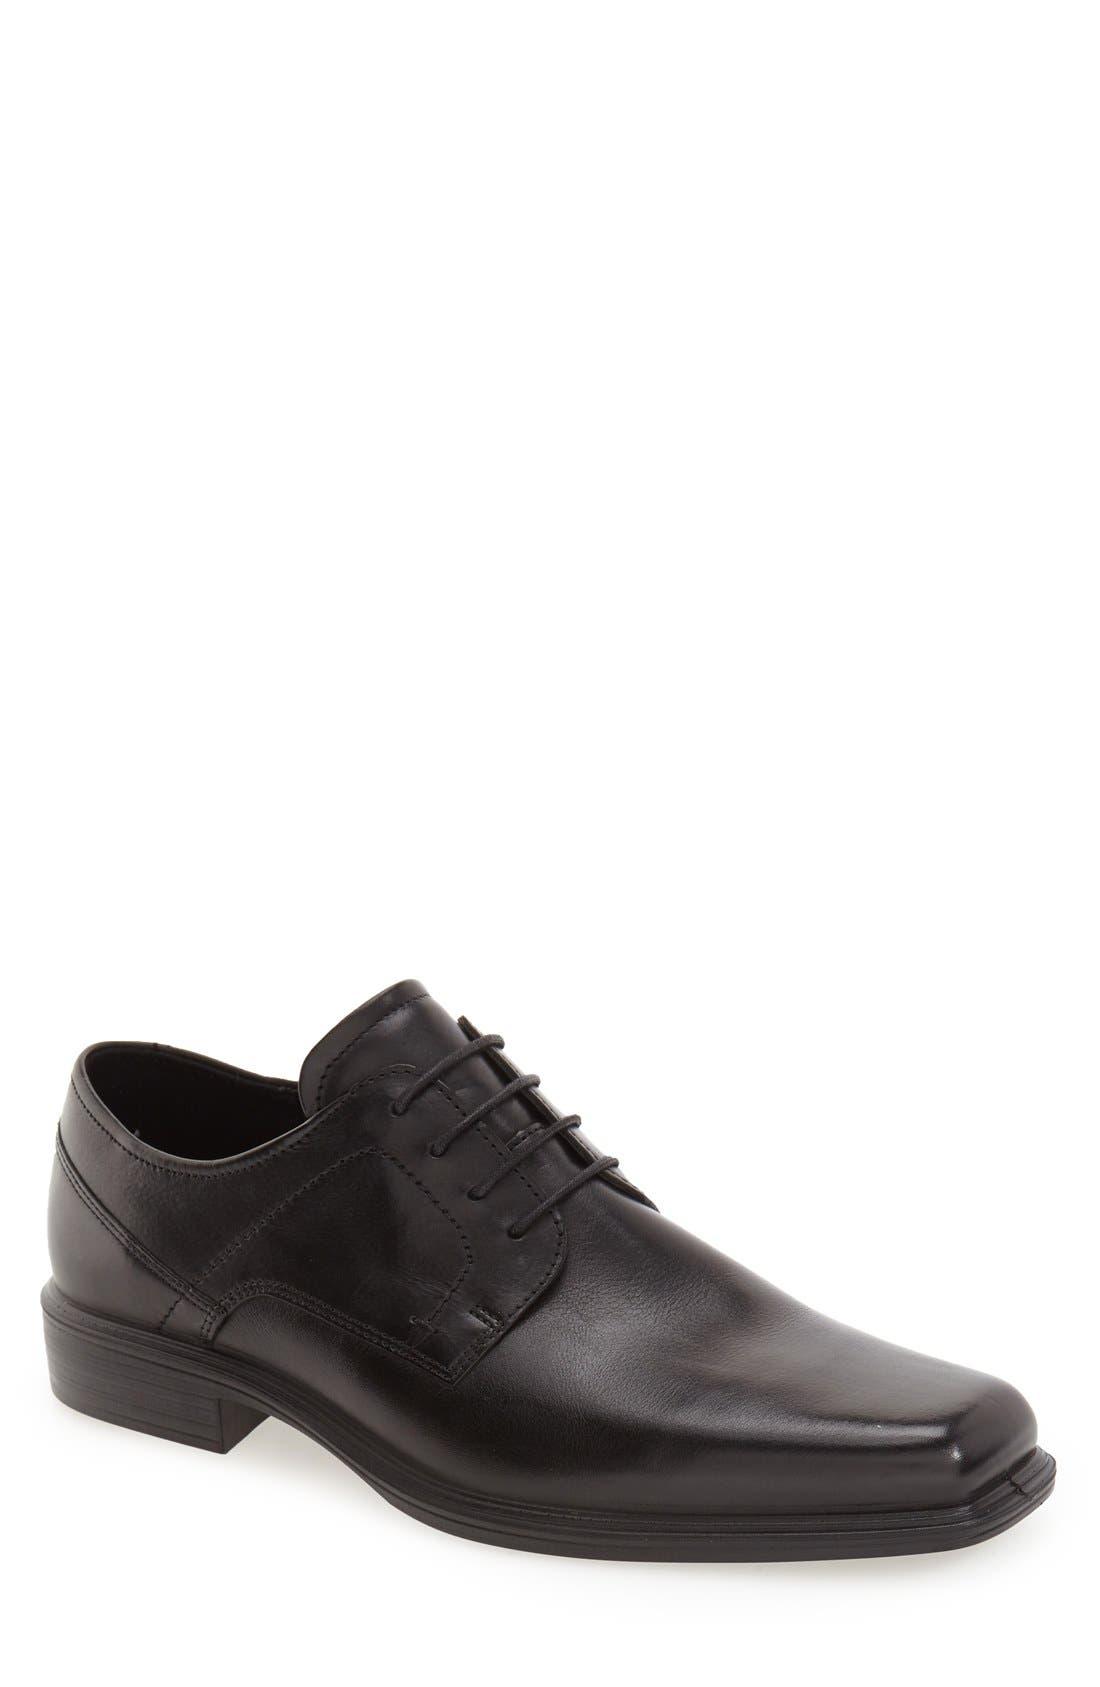 'Johannesburg' Plain Toe Derby,                         Main,                         color, Black Leather